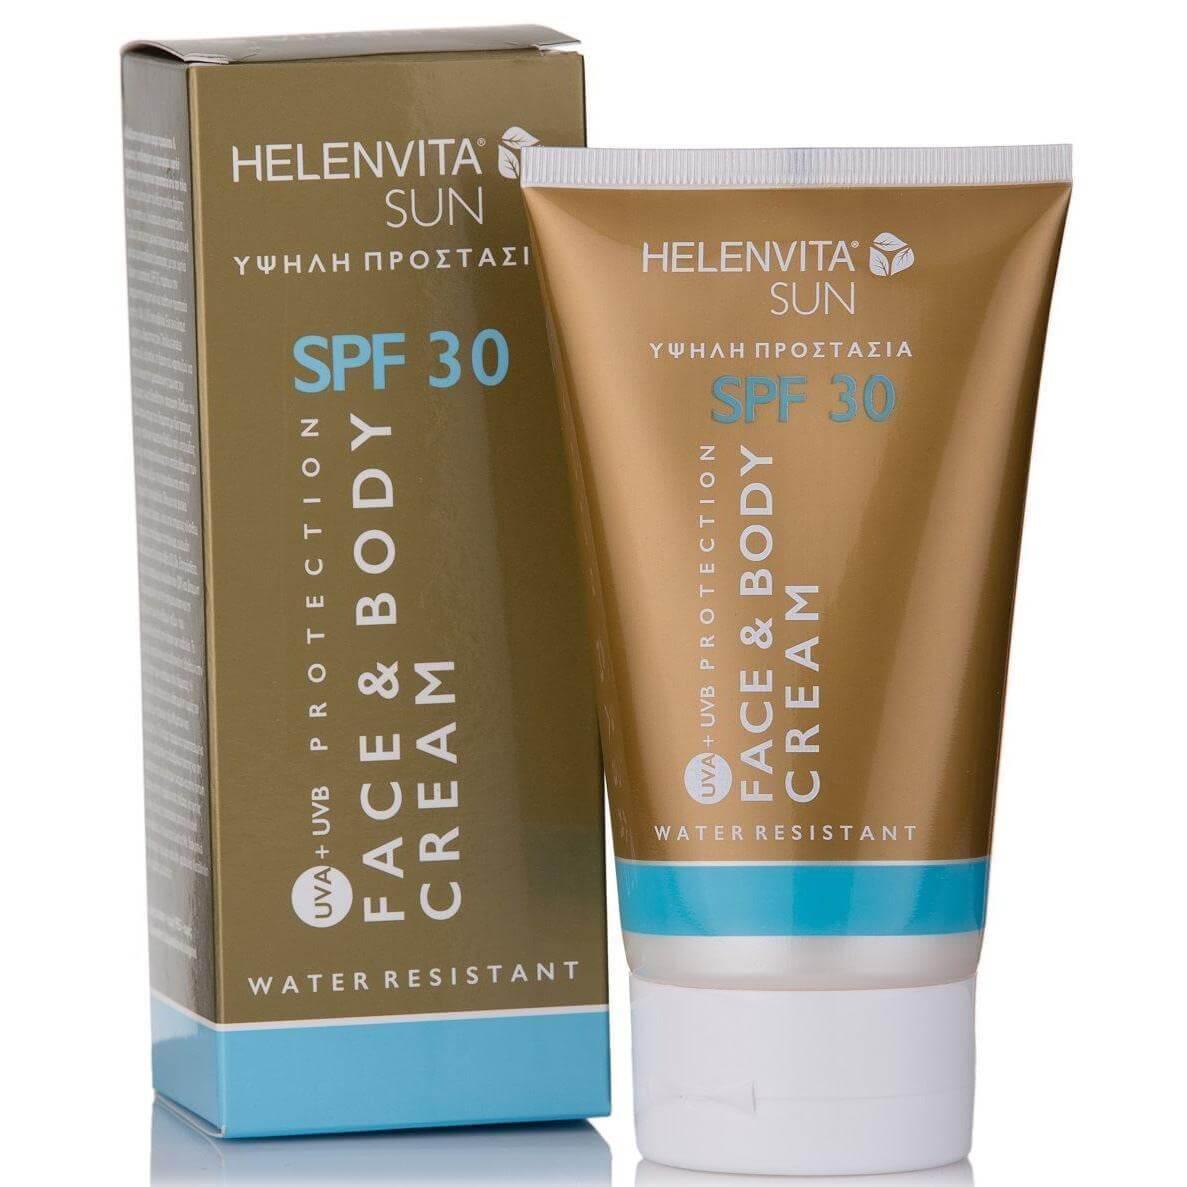 Helenvita Sun Face & Body Cream Spf30 Αδιάβροχη Αντηλιακή Κρέμα Προσώπου-Σώματος Υψηλής Παθητικής & Ενεργητικής Προστασίας 150ml